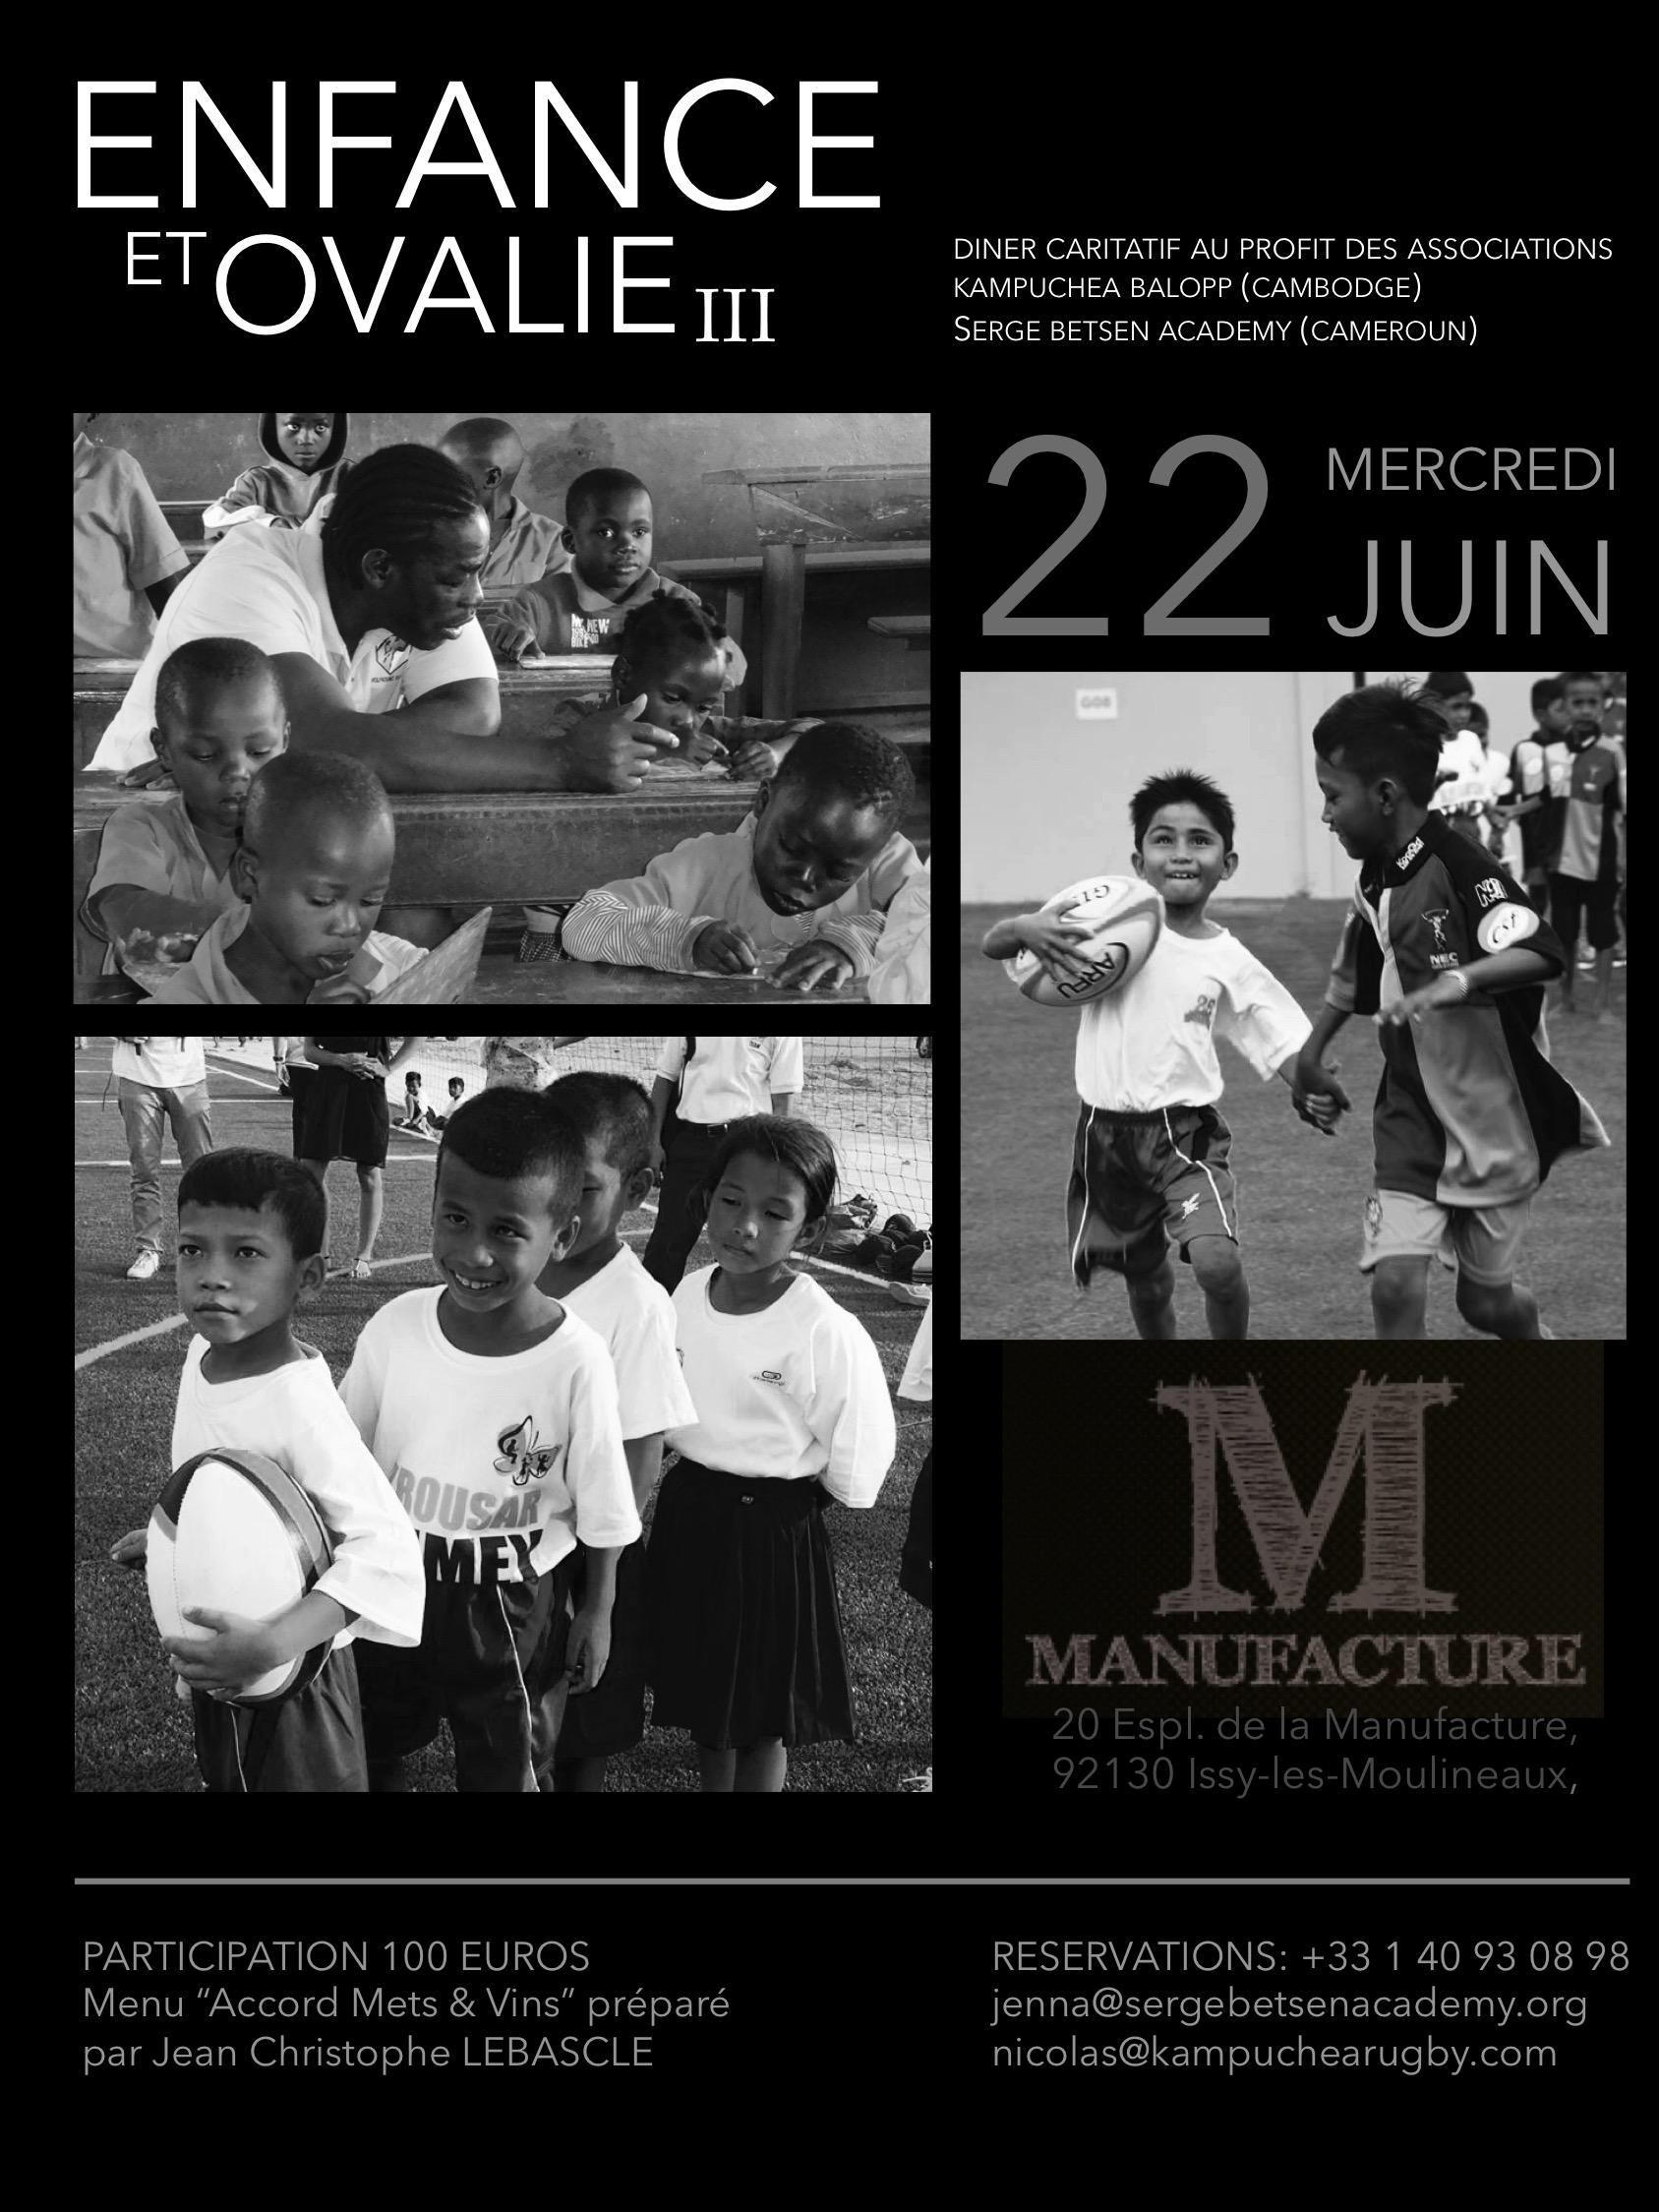 E-Invite Enfance & Ovalie - 22 Juin 2016 - PARIS a-